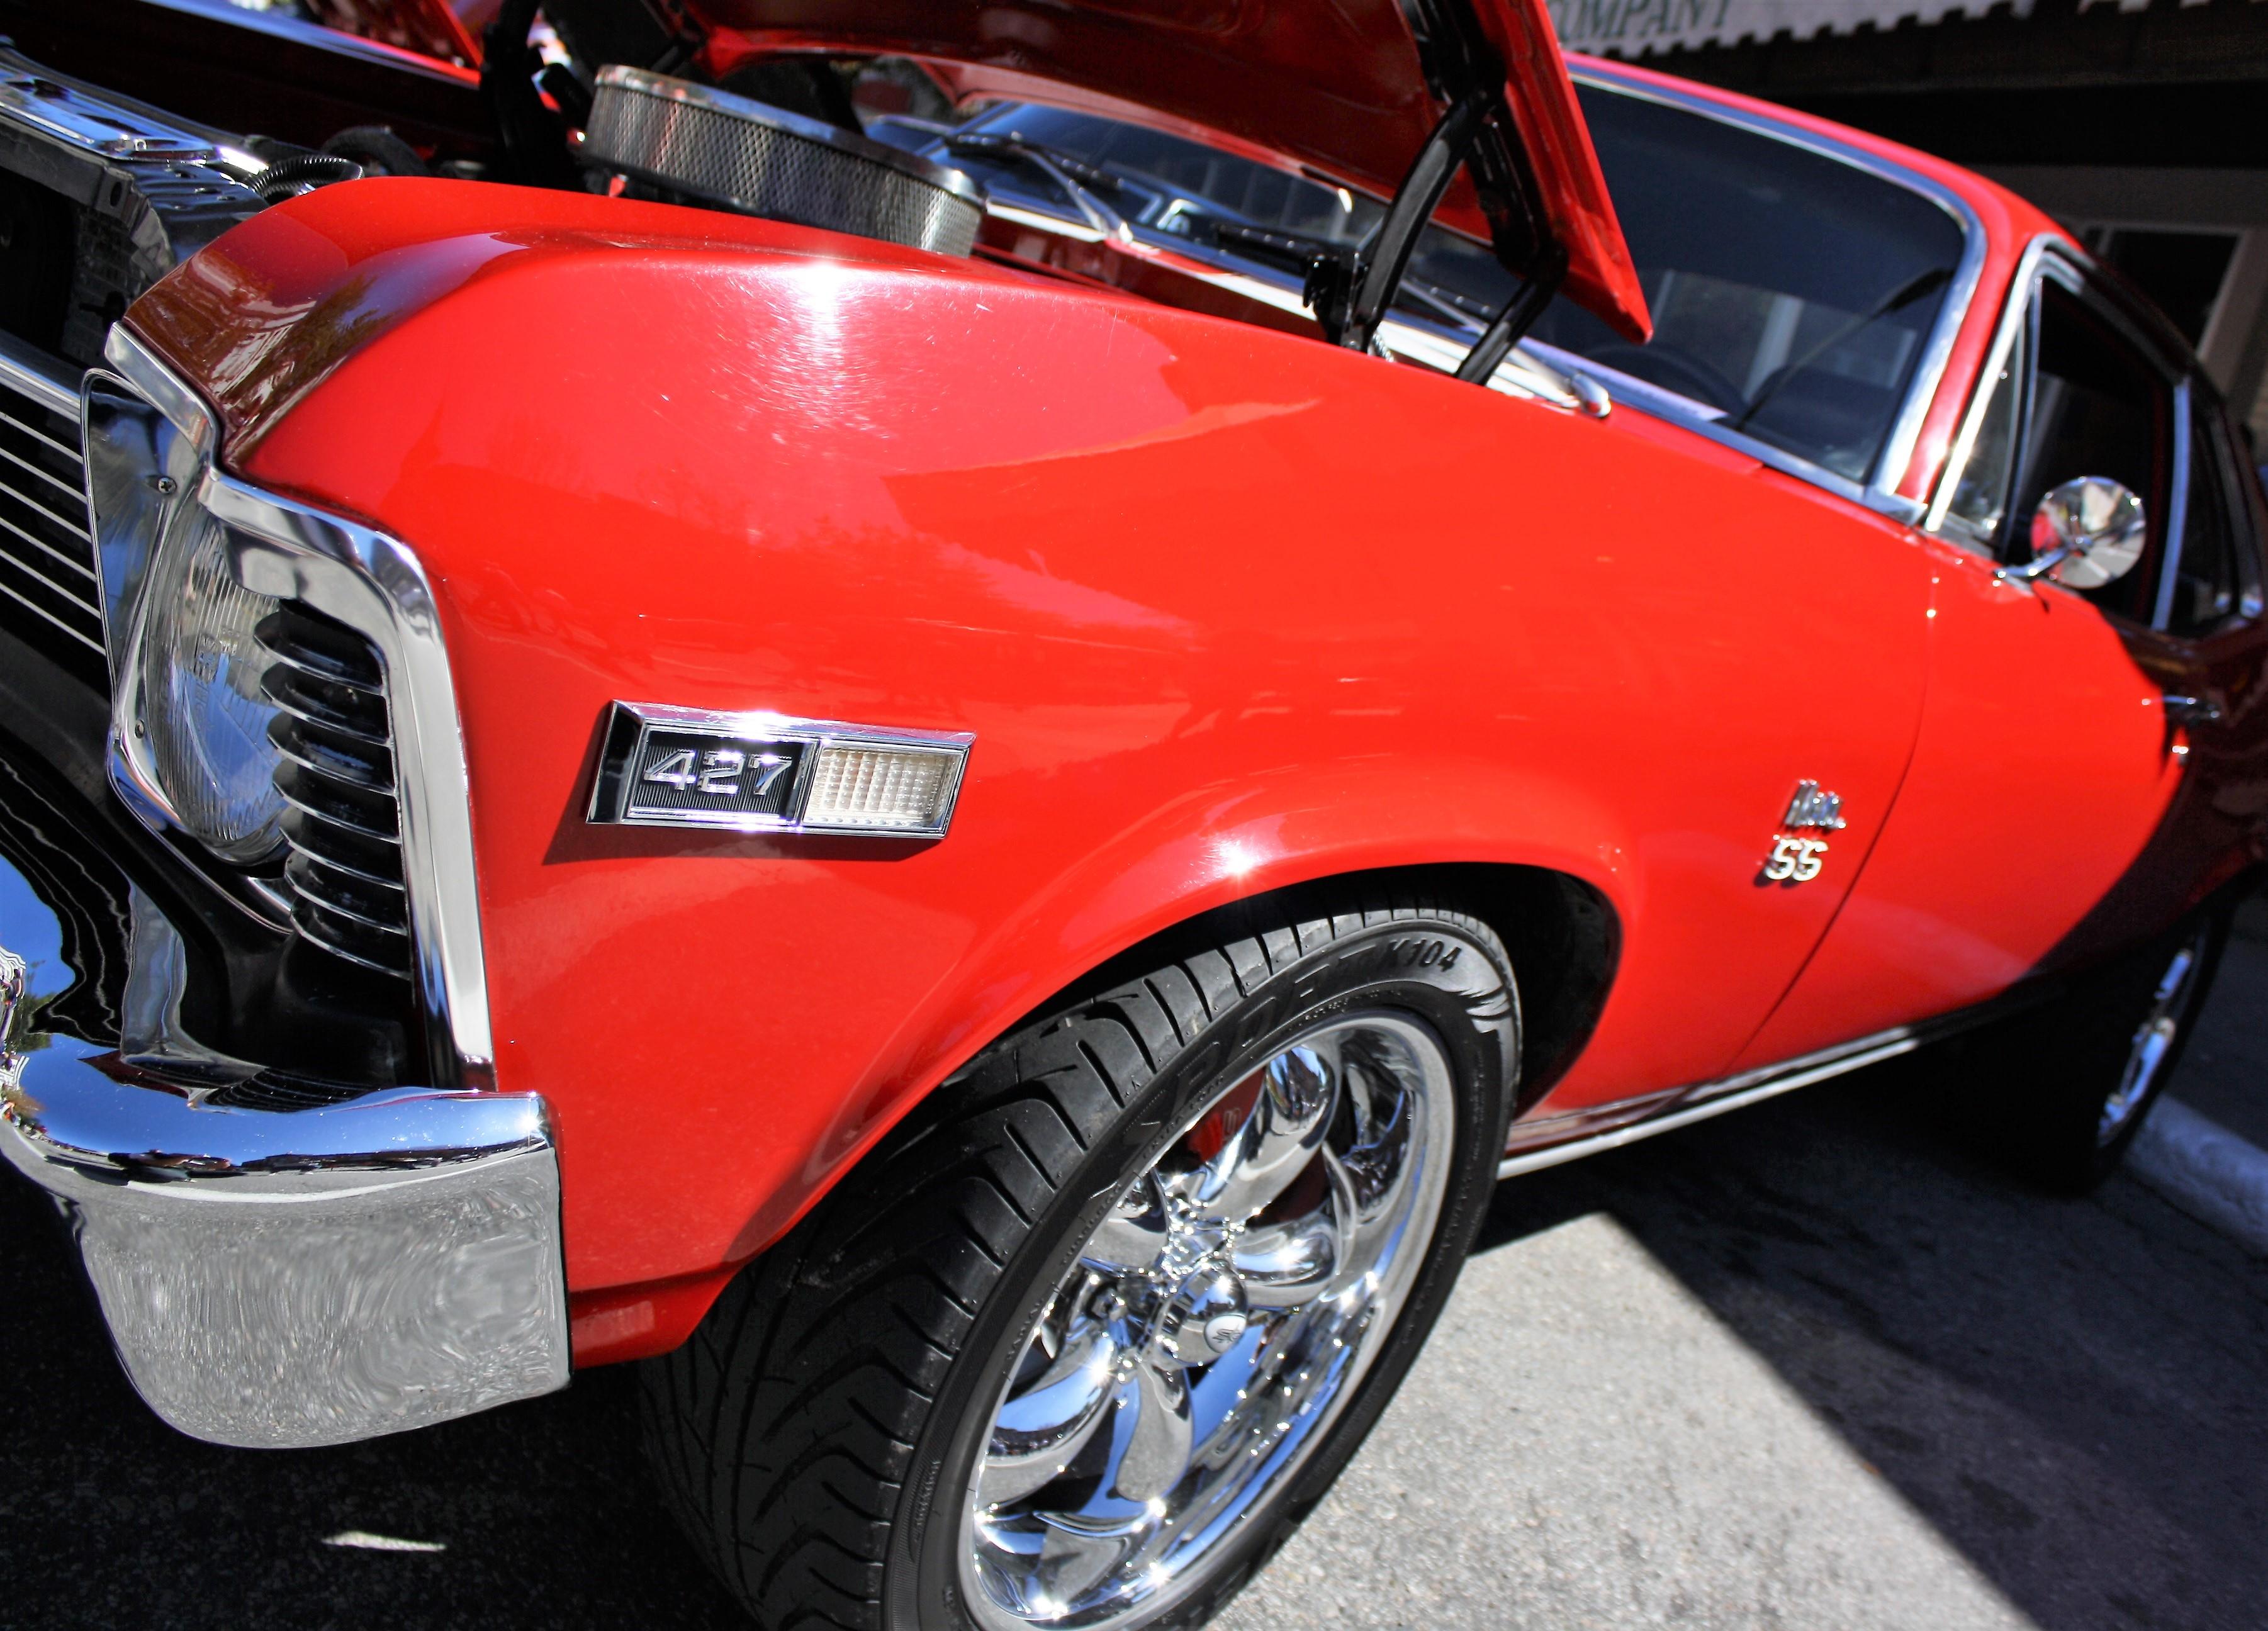 DM_vehicles_cars_7380